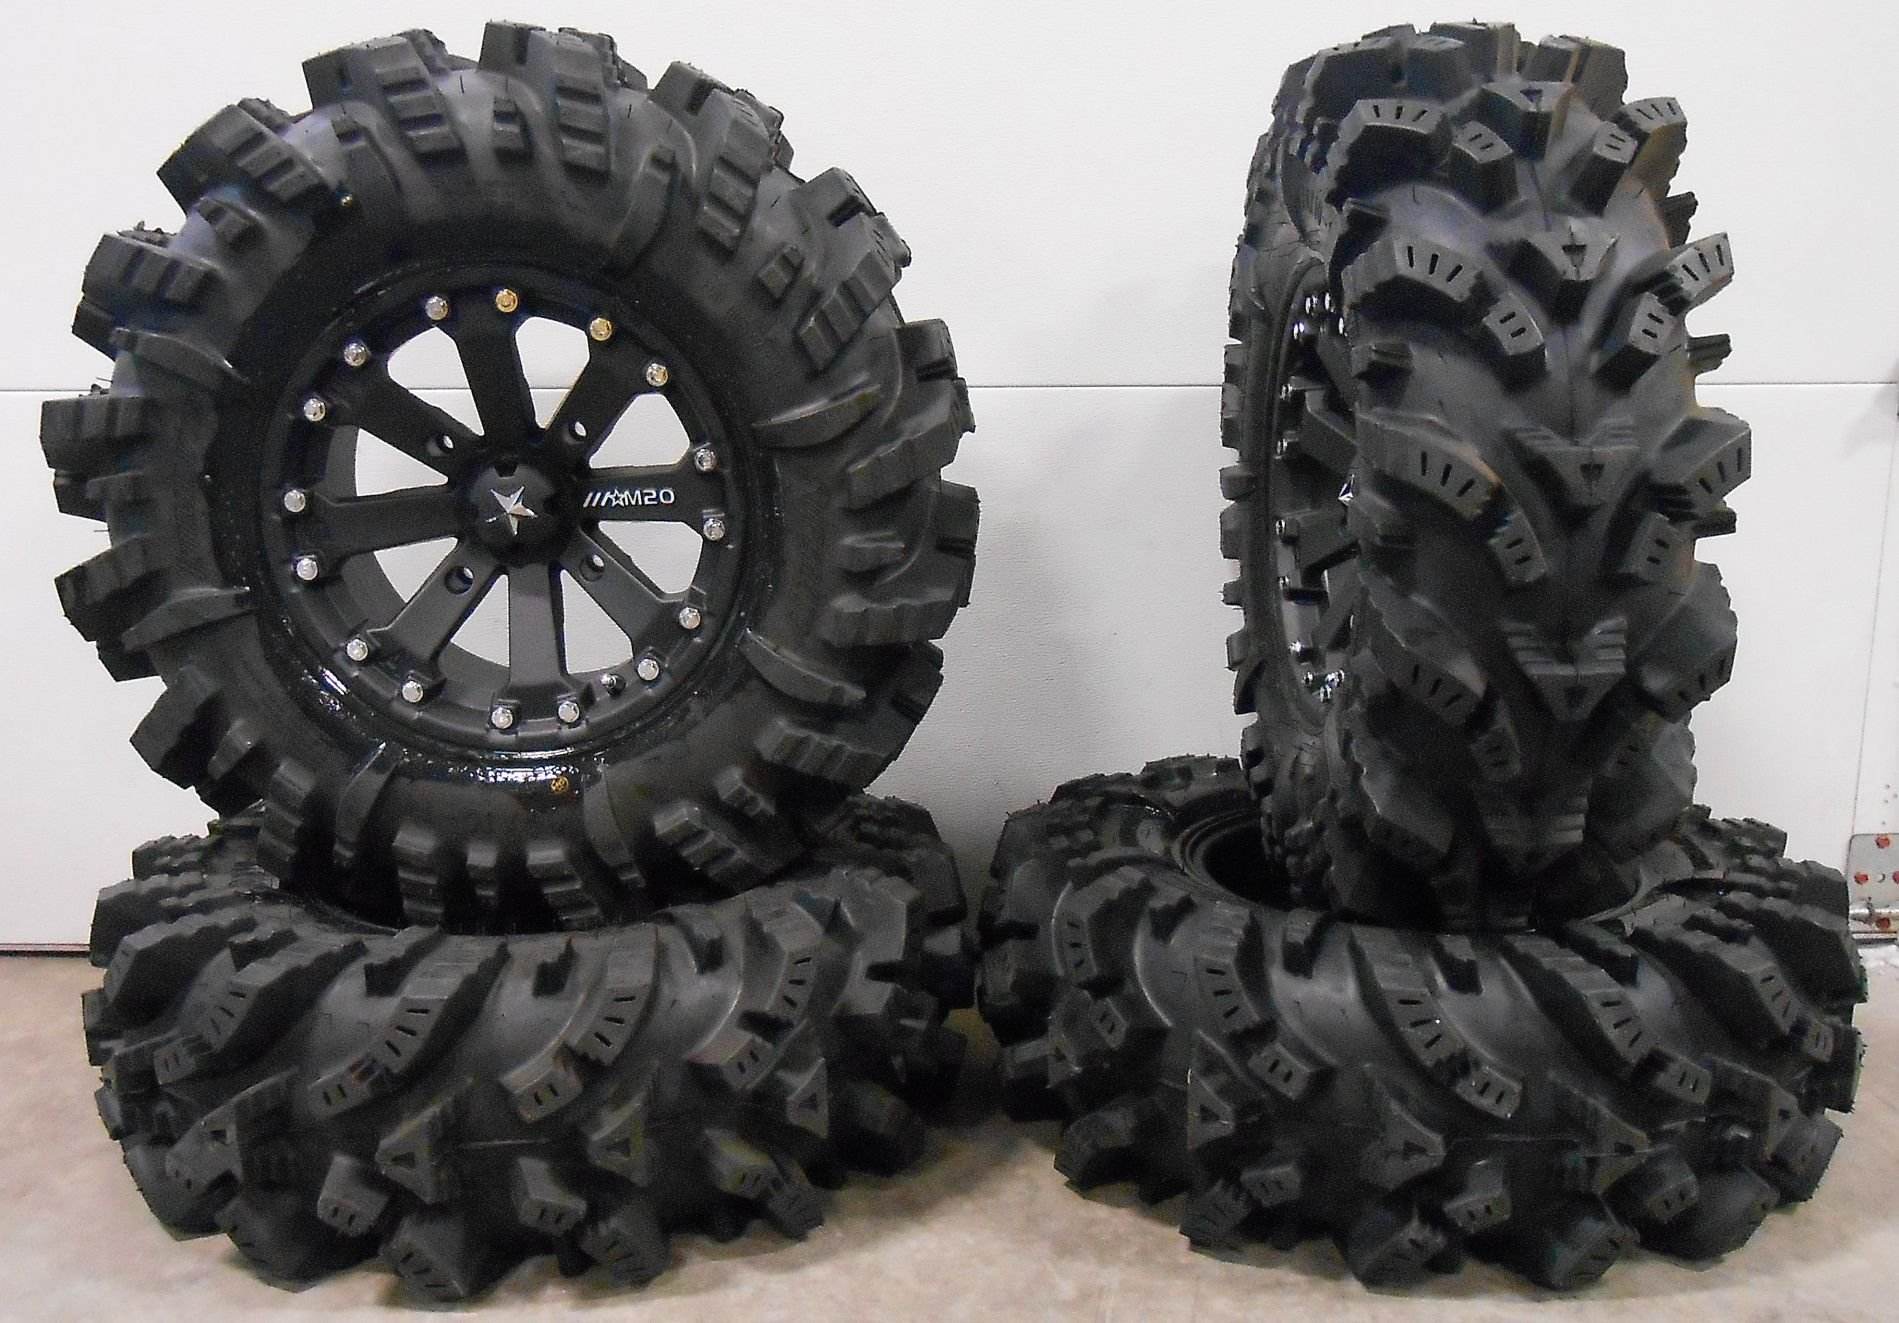 Bundle - 9 Items: MSA Black Kore 14'' UTV Wheels 30'' Intimidator Tires [4x137 Bolt Pattern 12mmx1.5 Lug Kit]